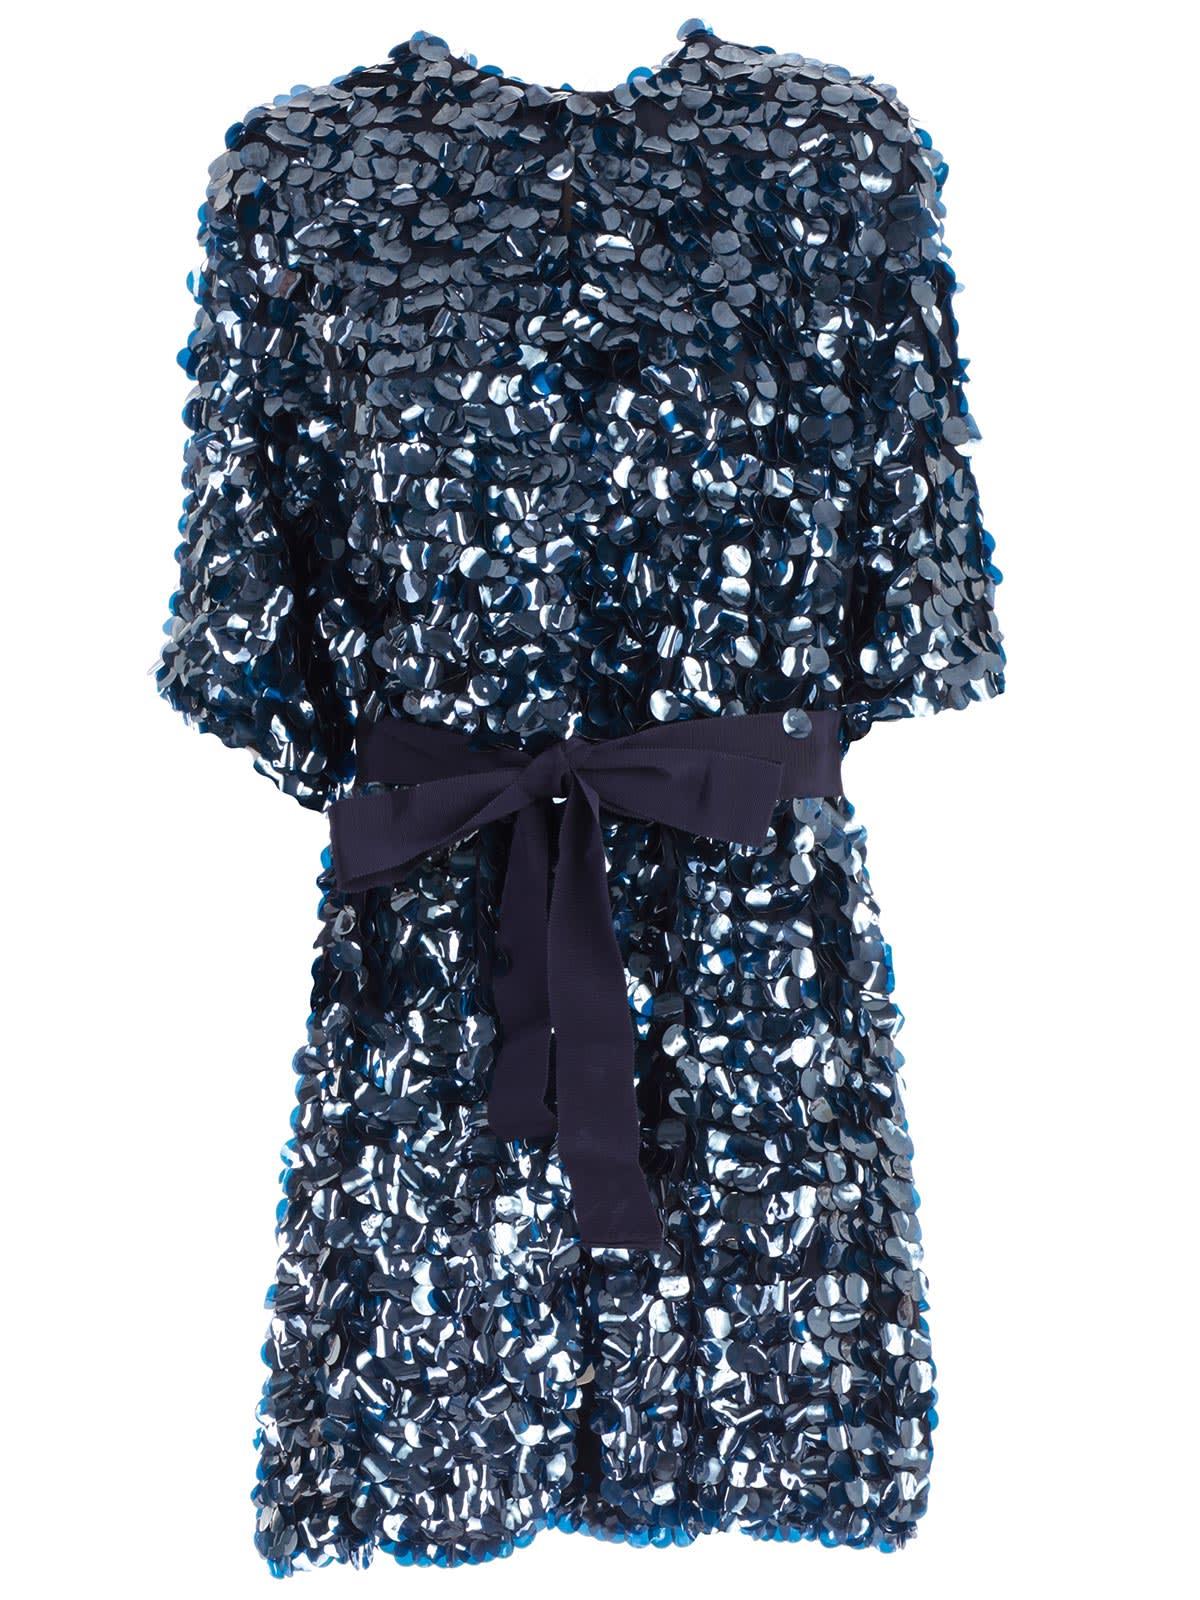 Parosh Embellished Dress